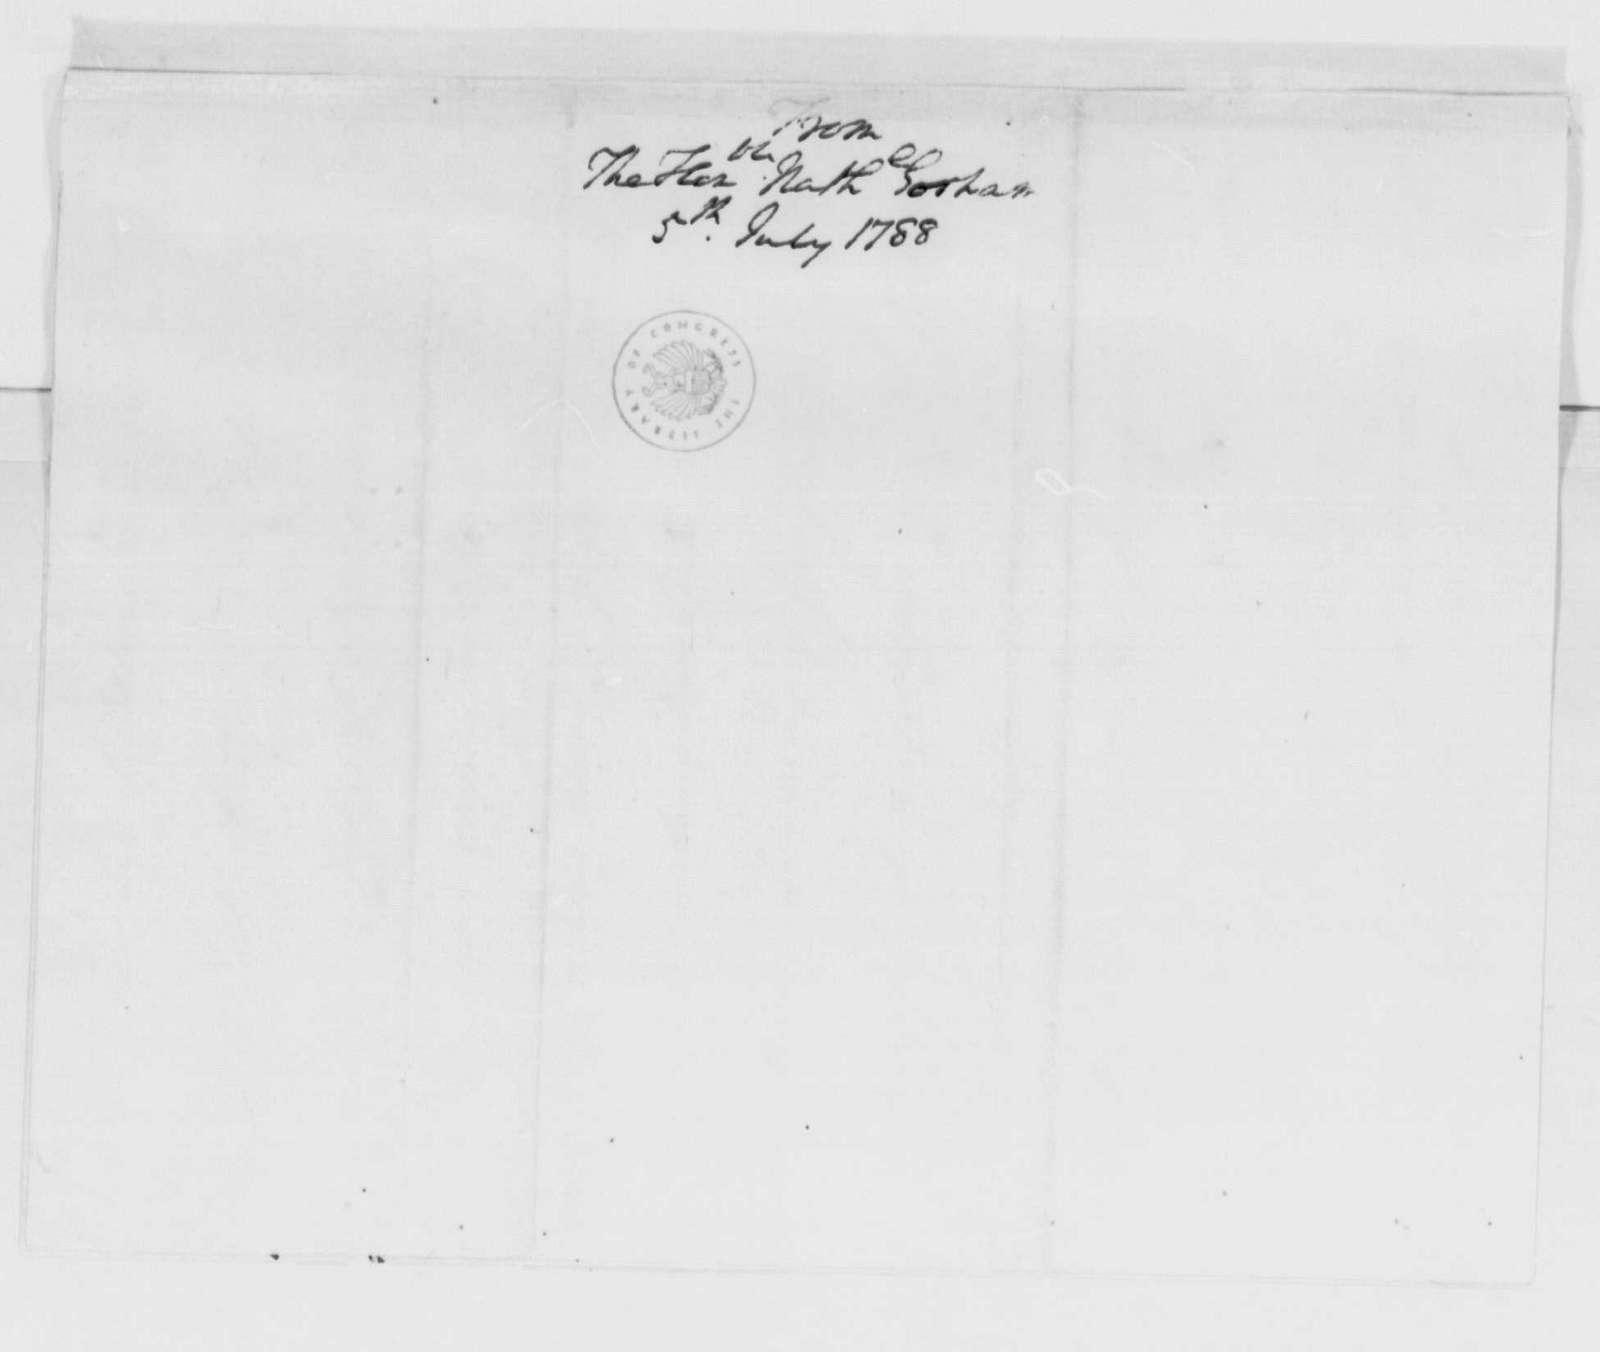 George Washington Papers, Series 4, General Correspondence: Nathaniel Gorham to George Washington, July 5, 1788